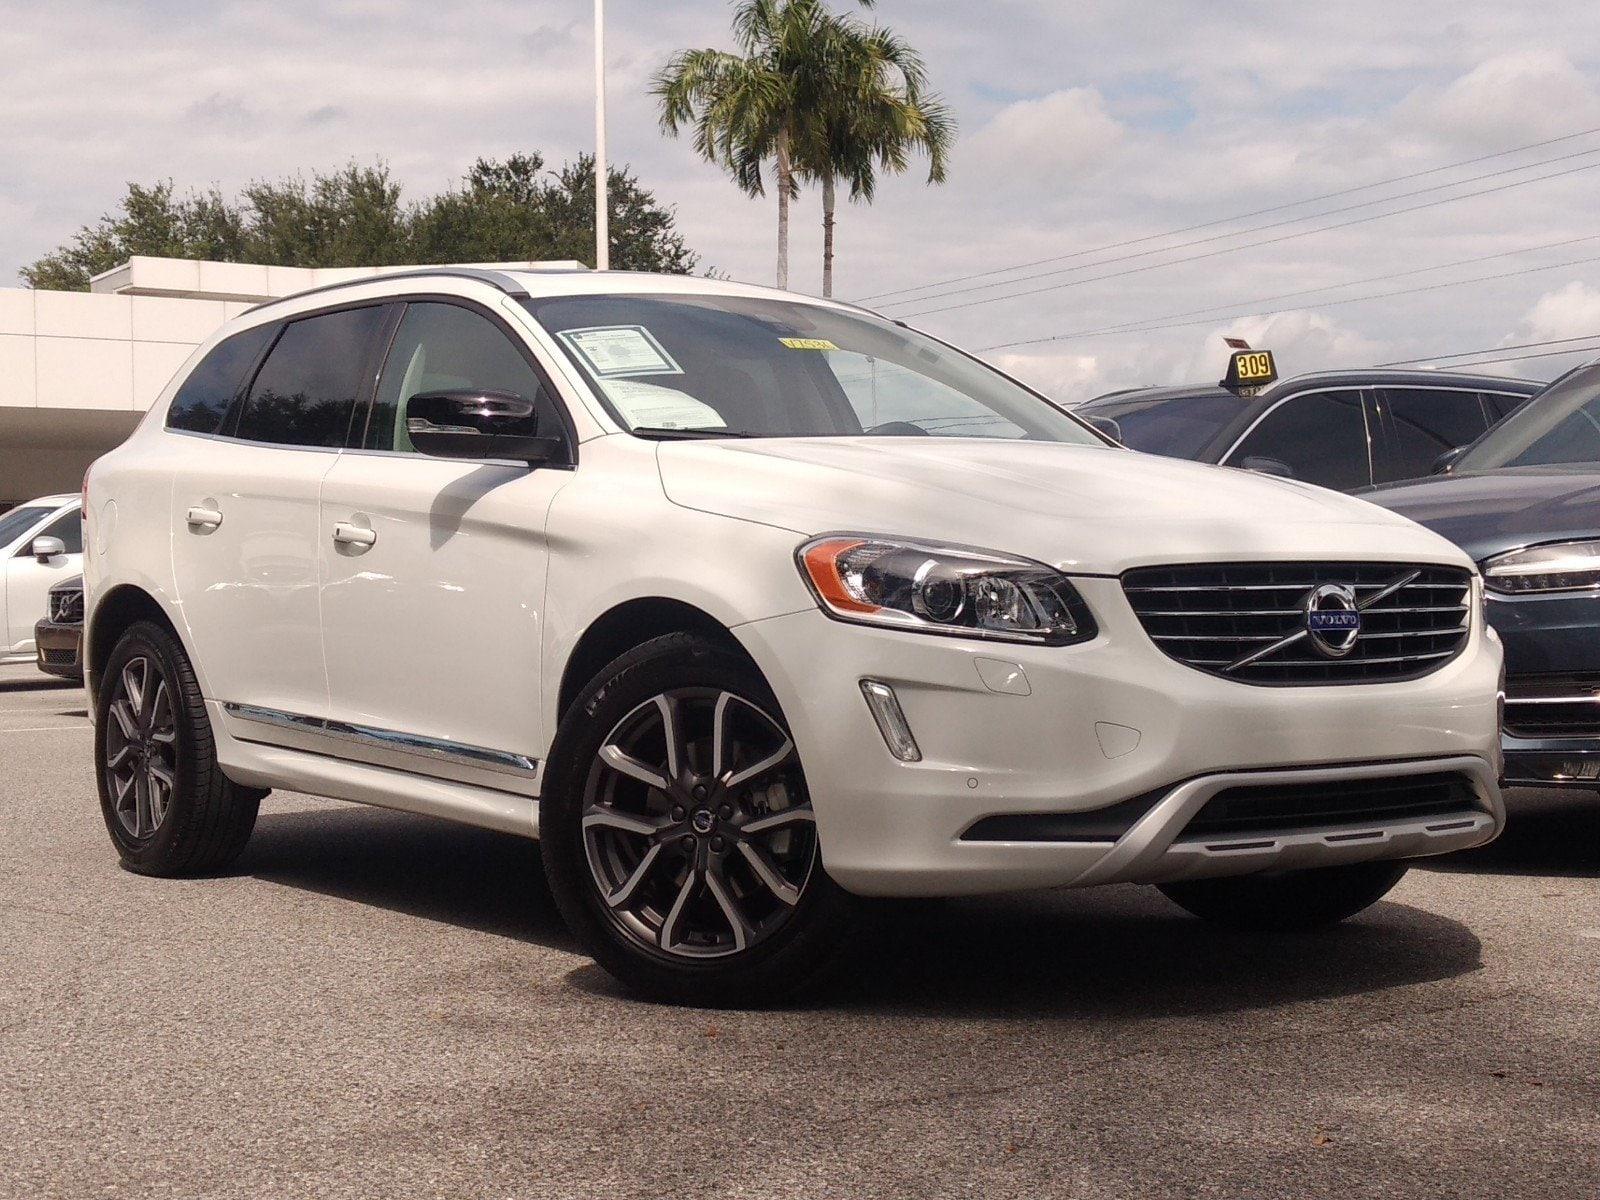 2017 Volvo XC60 Dynamic T6 AWD Dynamic for sale in Sarasota, FL